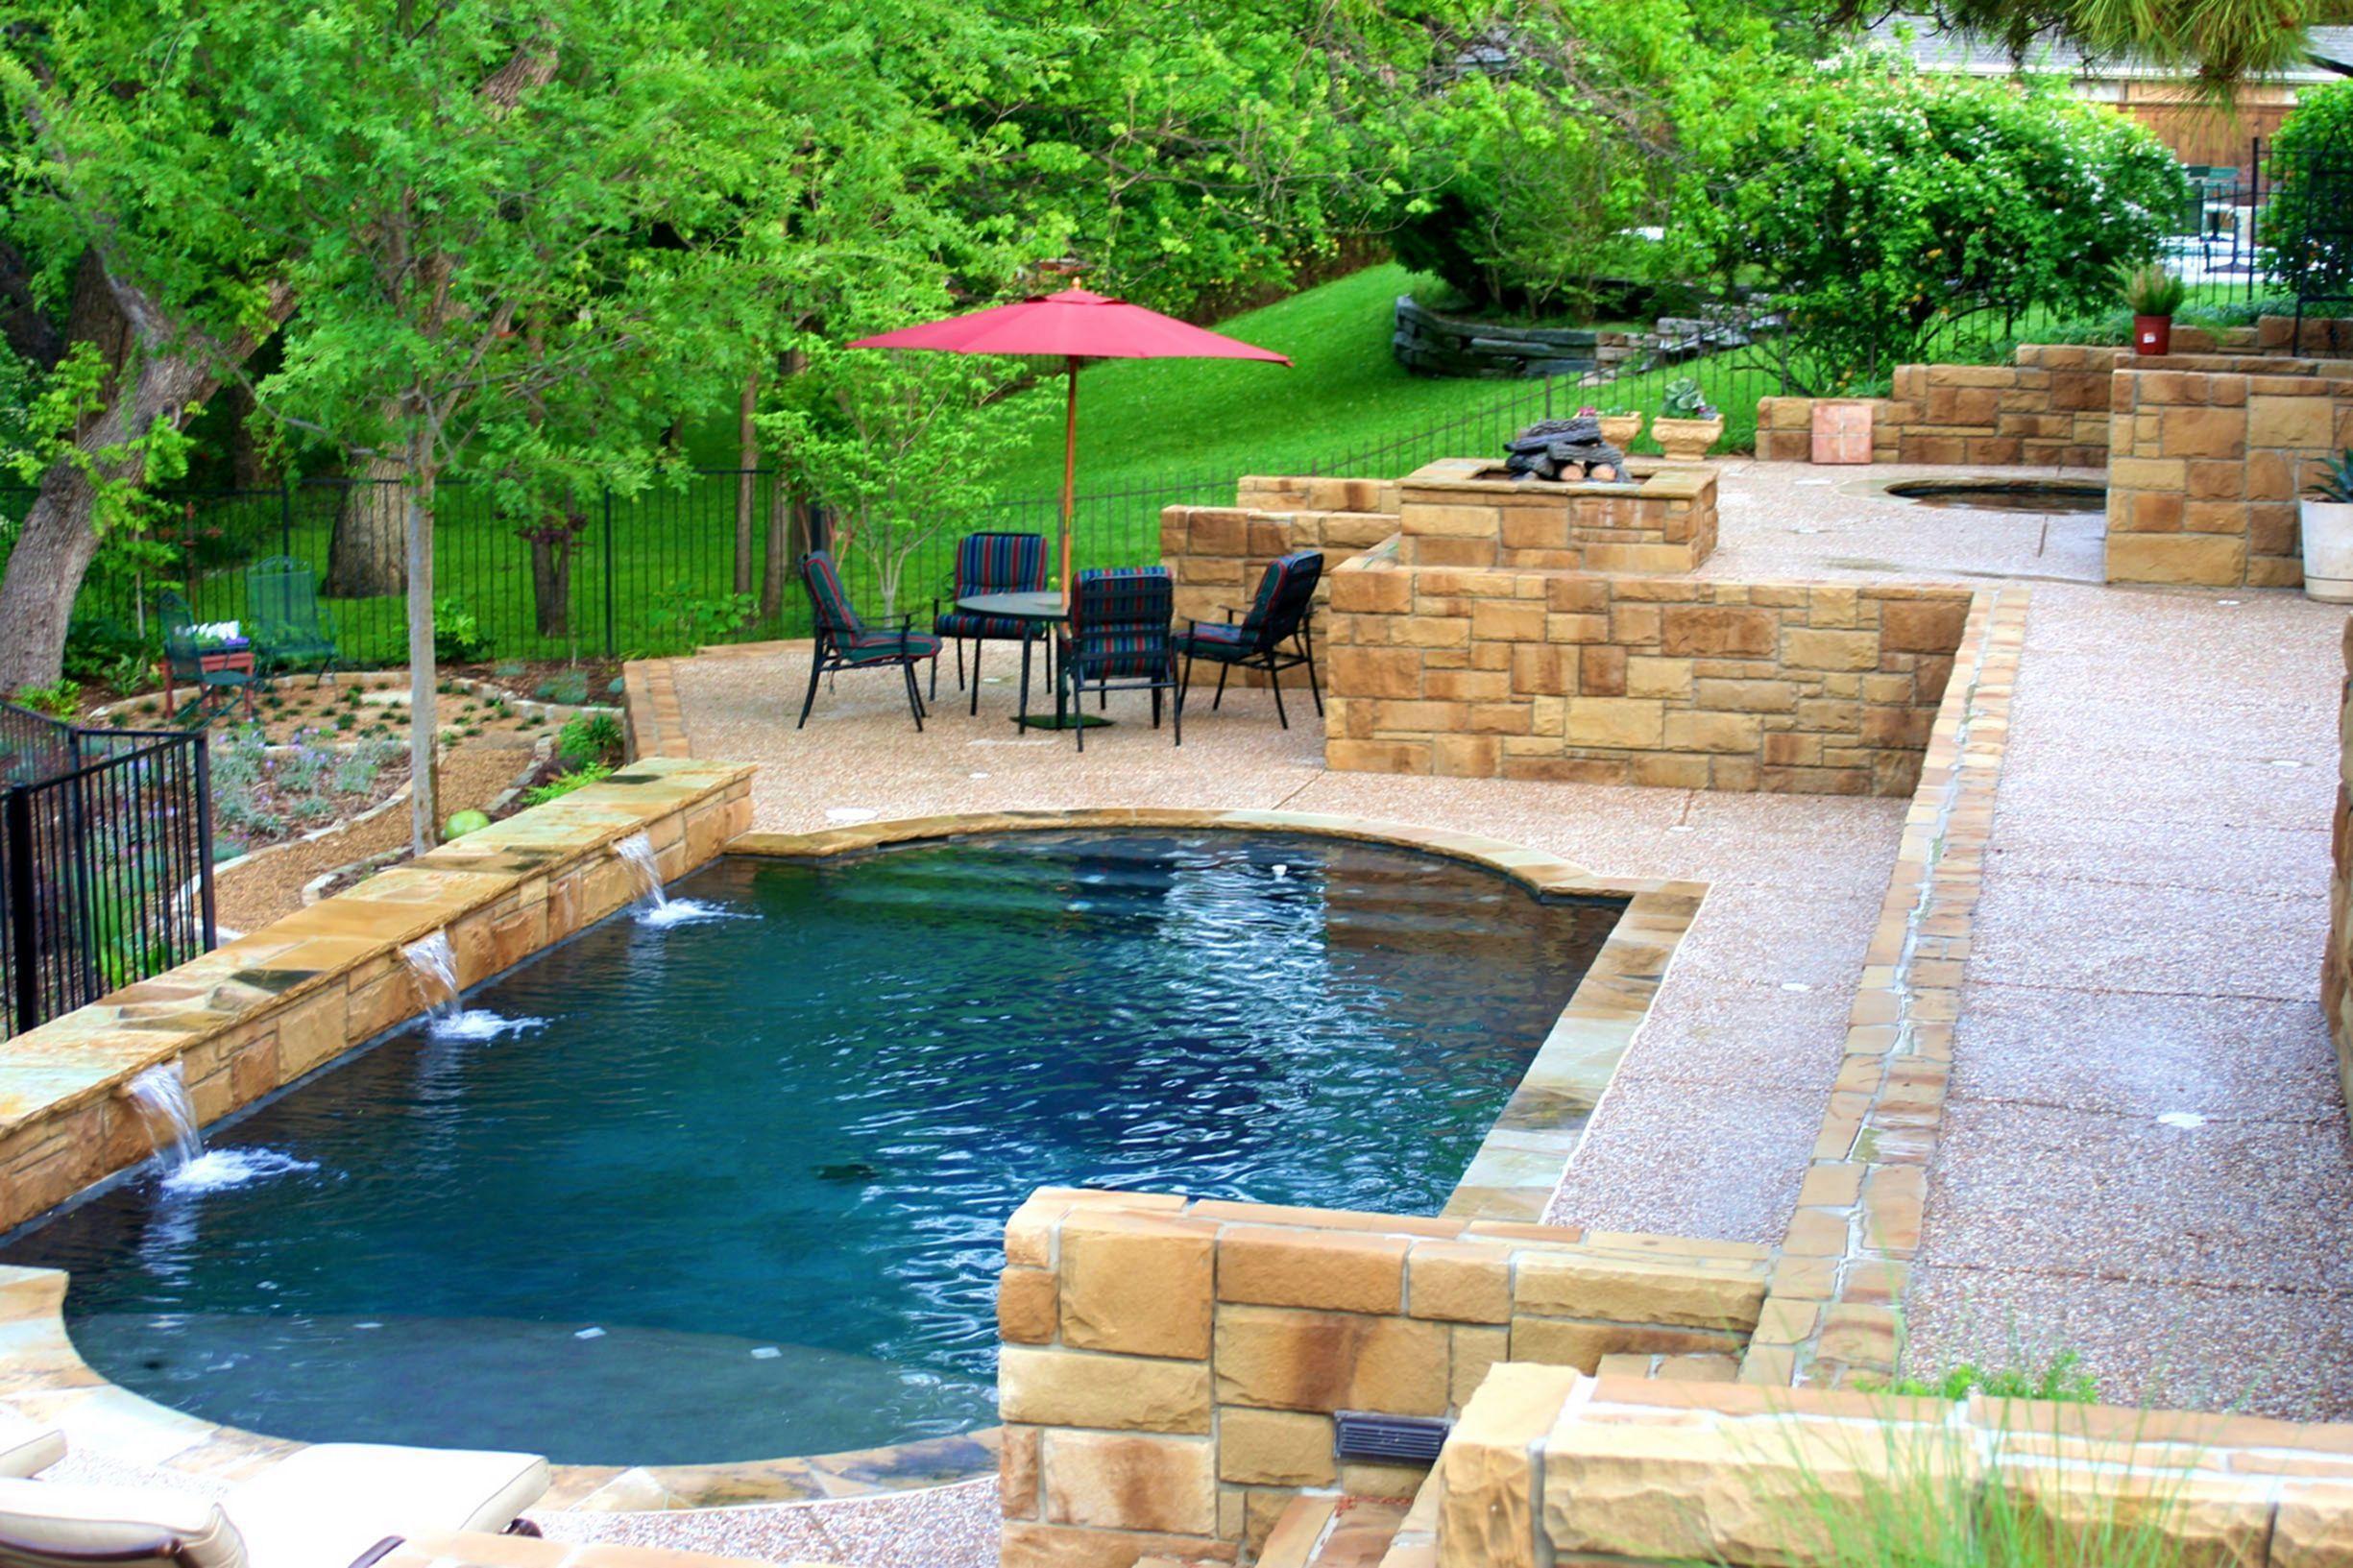 Marvelous small pool design ideas 10142